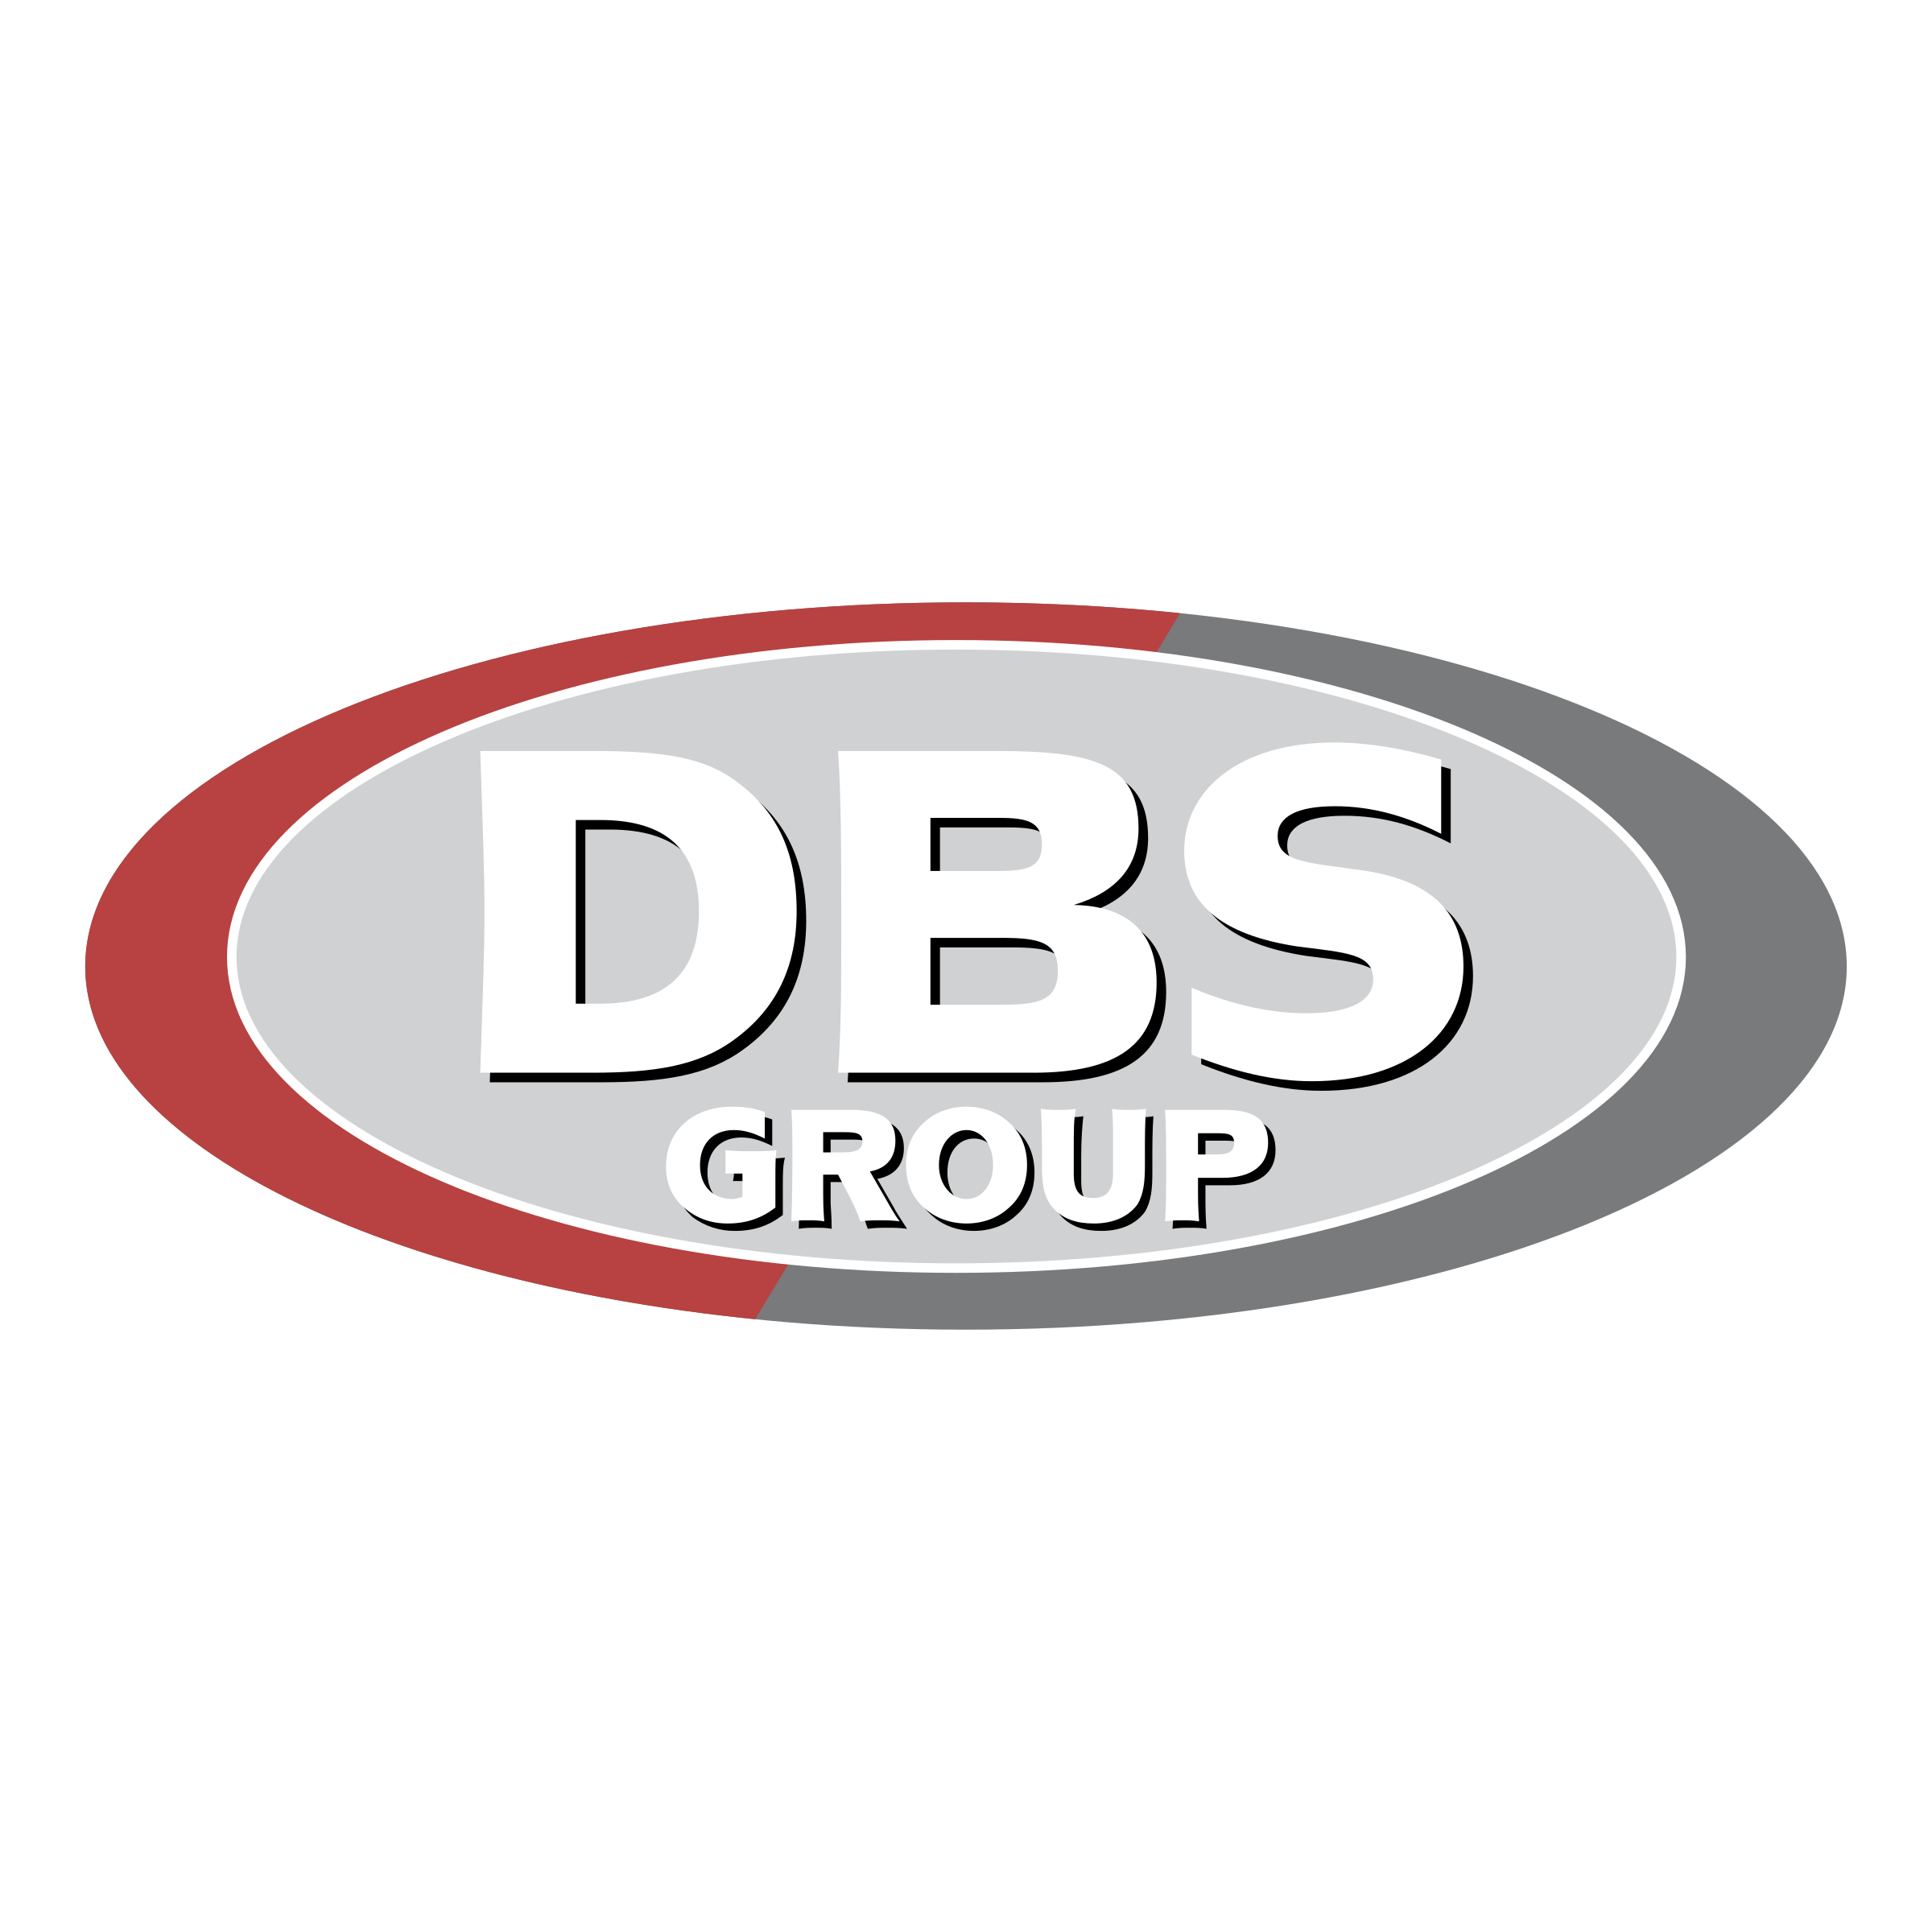 DBS Group Logo PNG Transparent & SVG Vector.